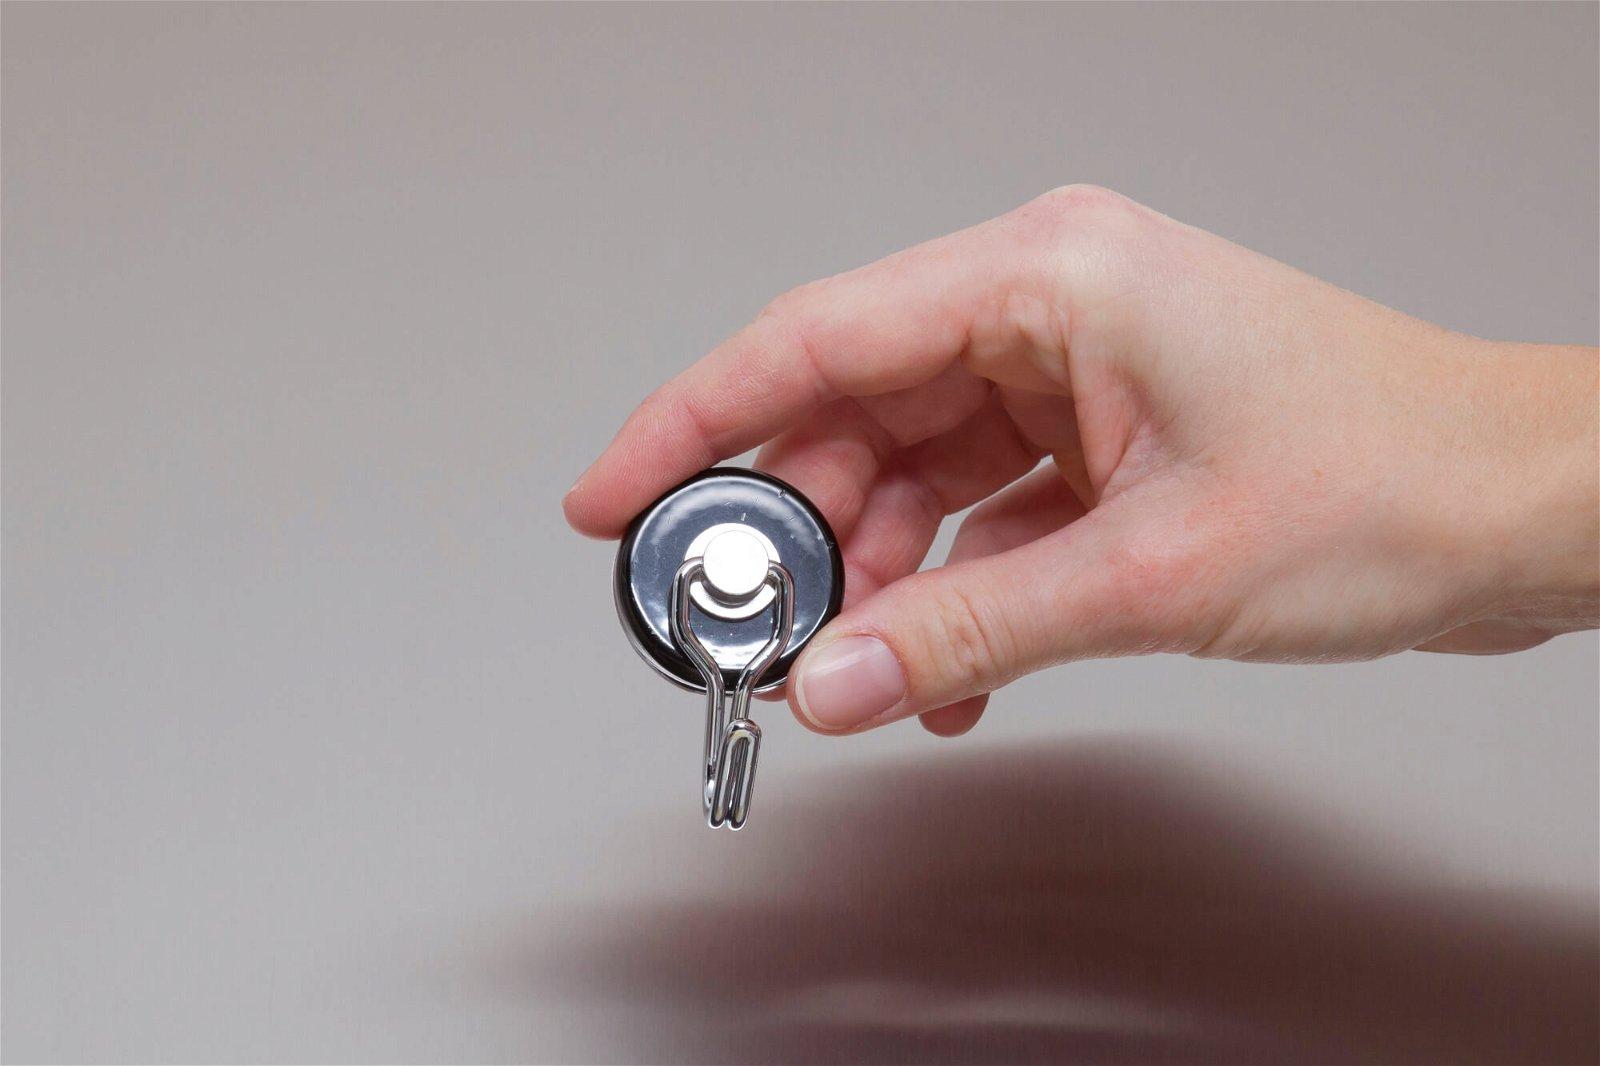 Magnet Karussell-Haken Ø 35 mm, 5 kg Haftkraft, 2 St./Set, schwarz